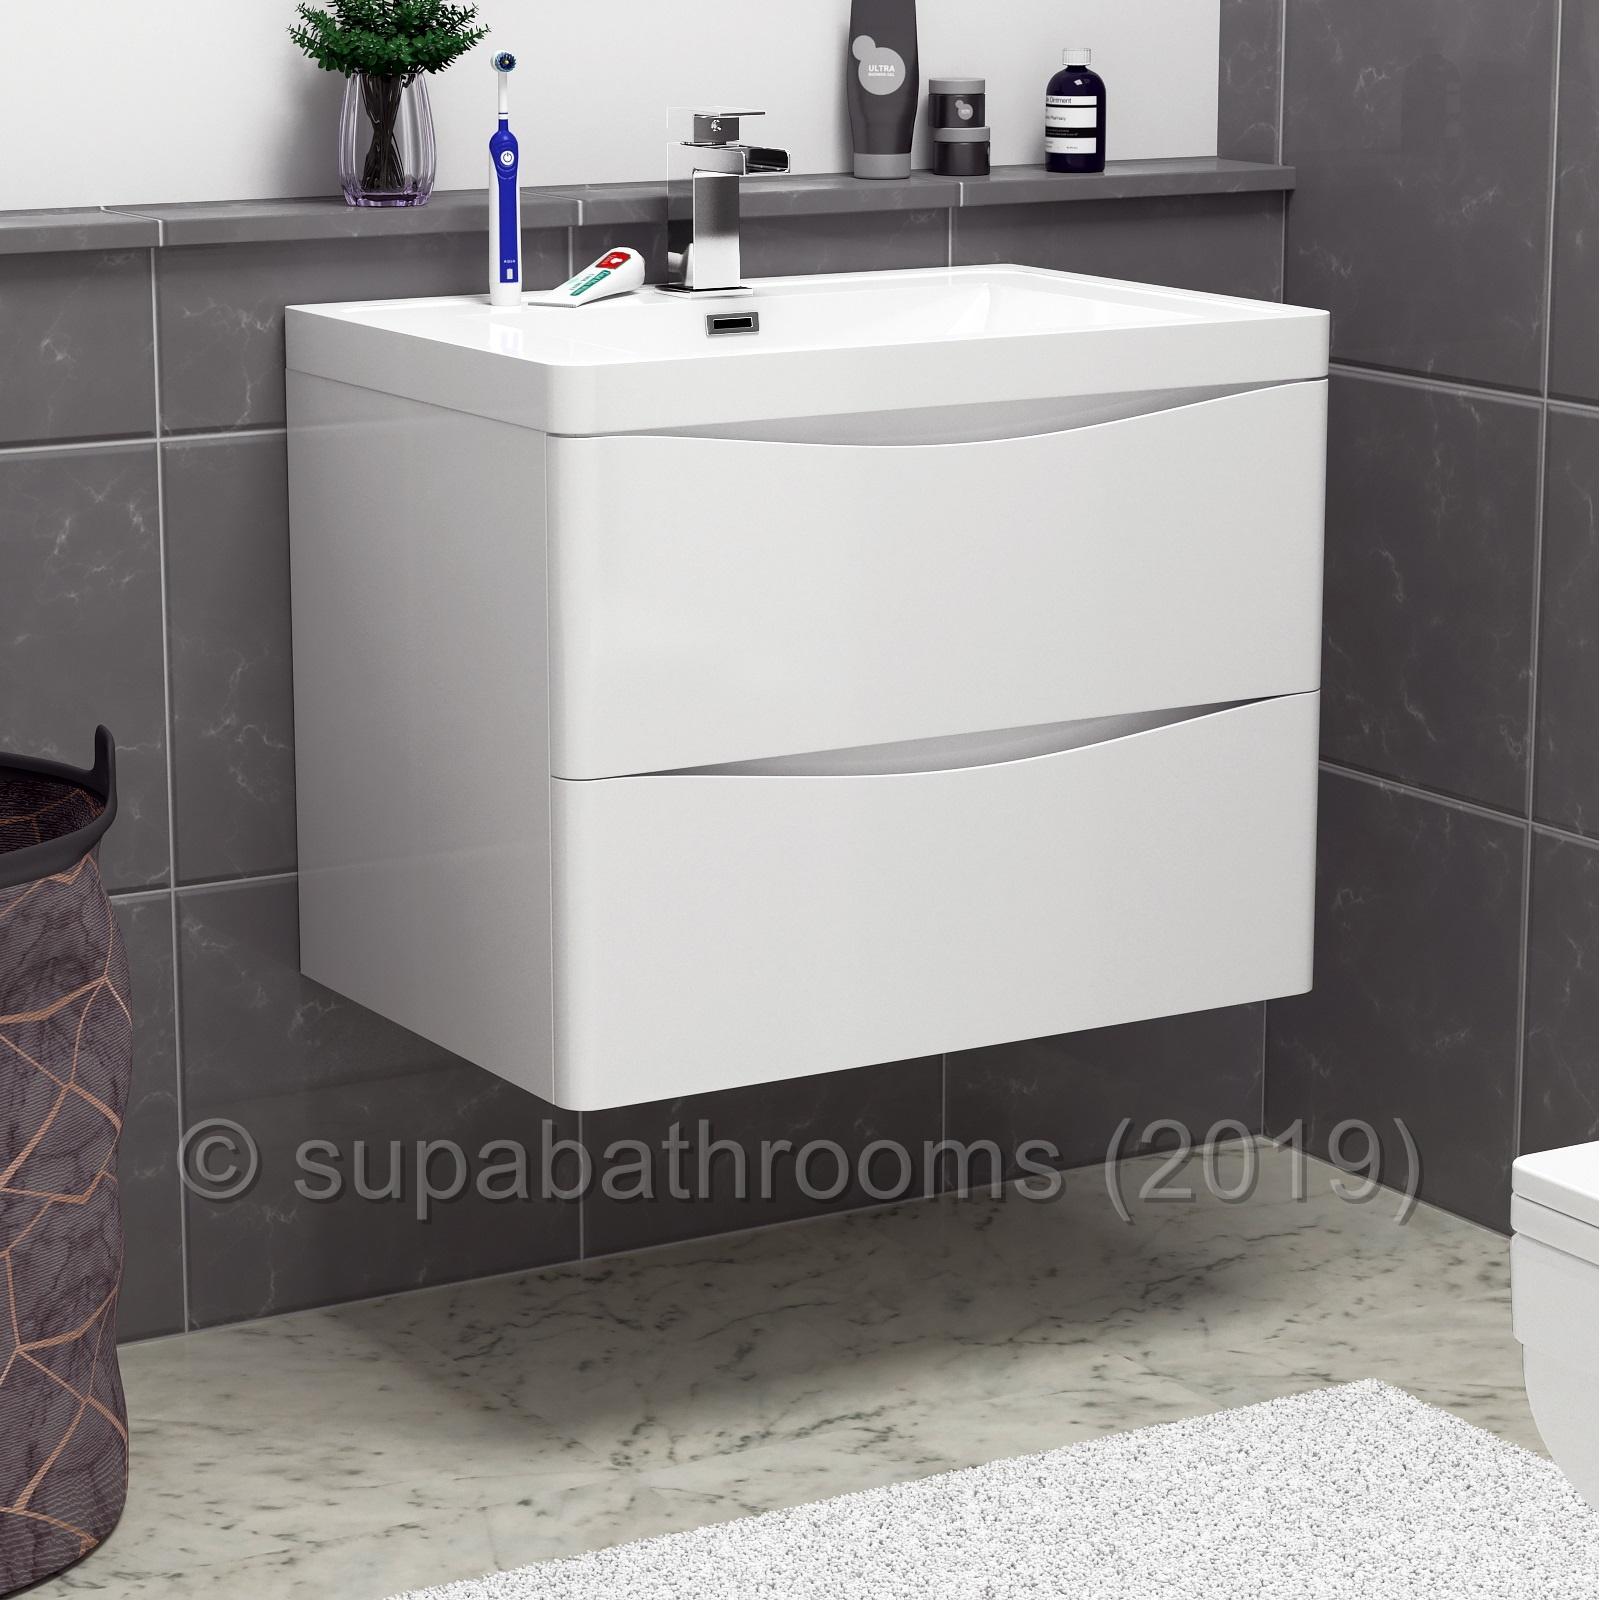 Bathroom Vanity Unit Storage With Sink High Gloss Cabinet 2 Drawers Ebay